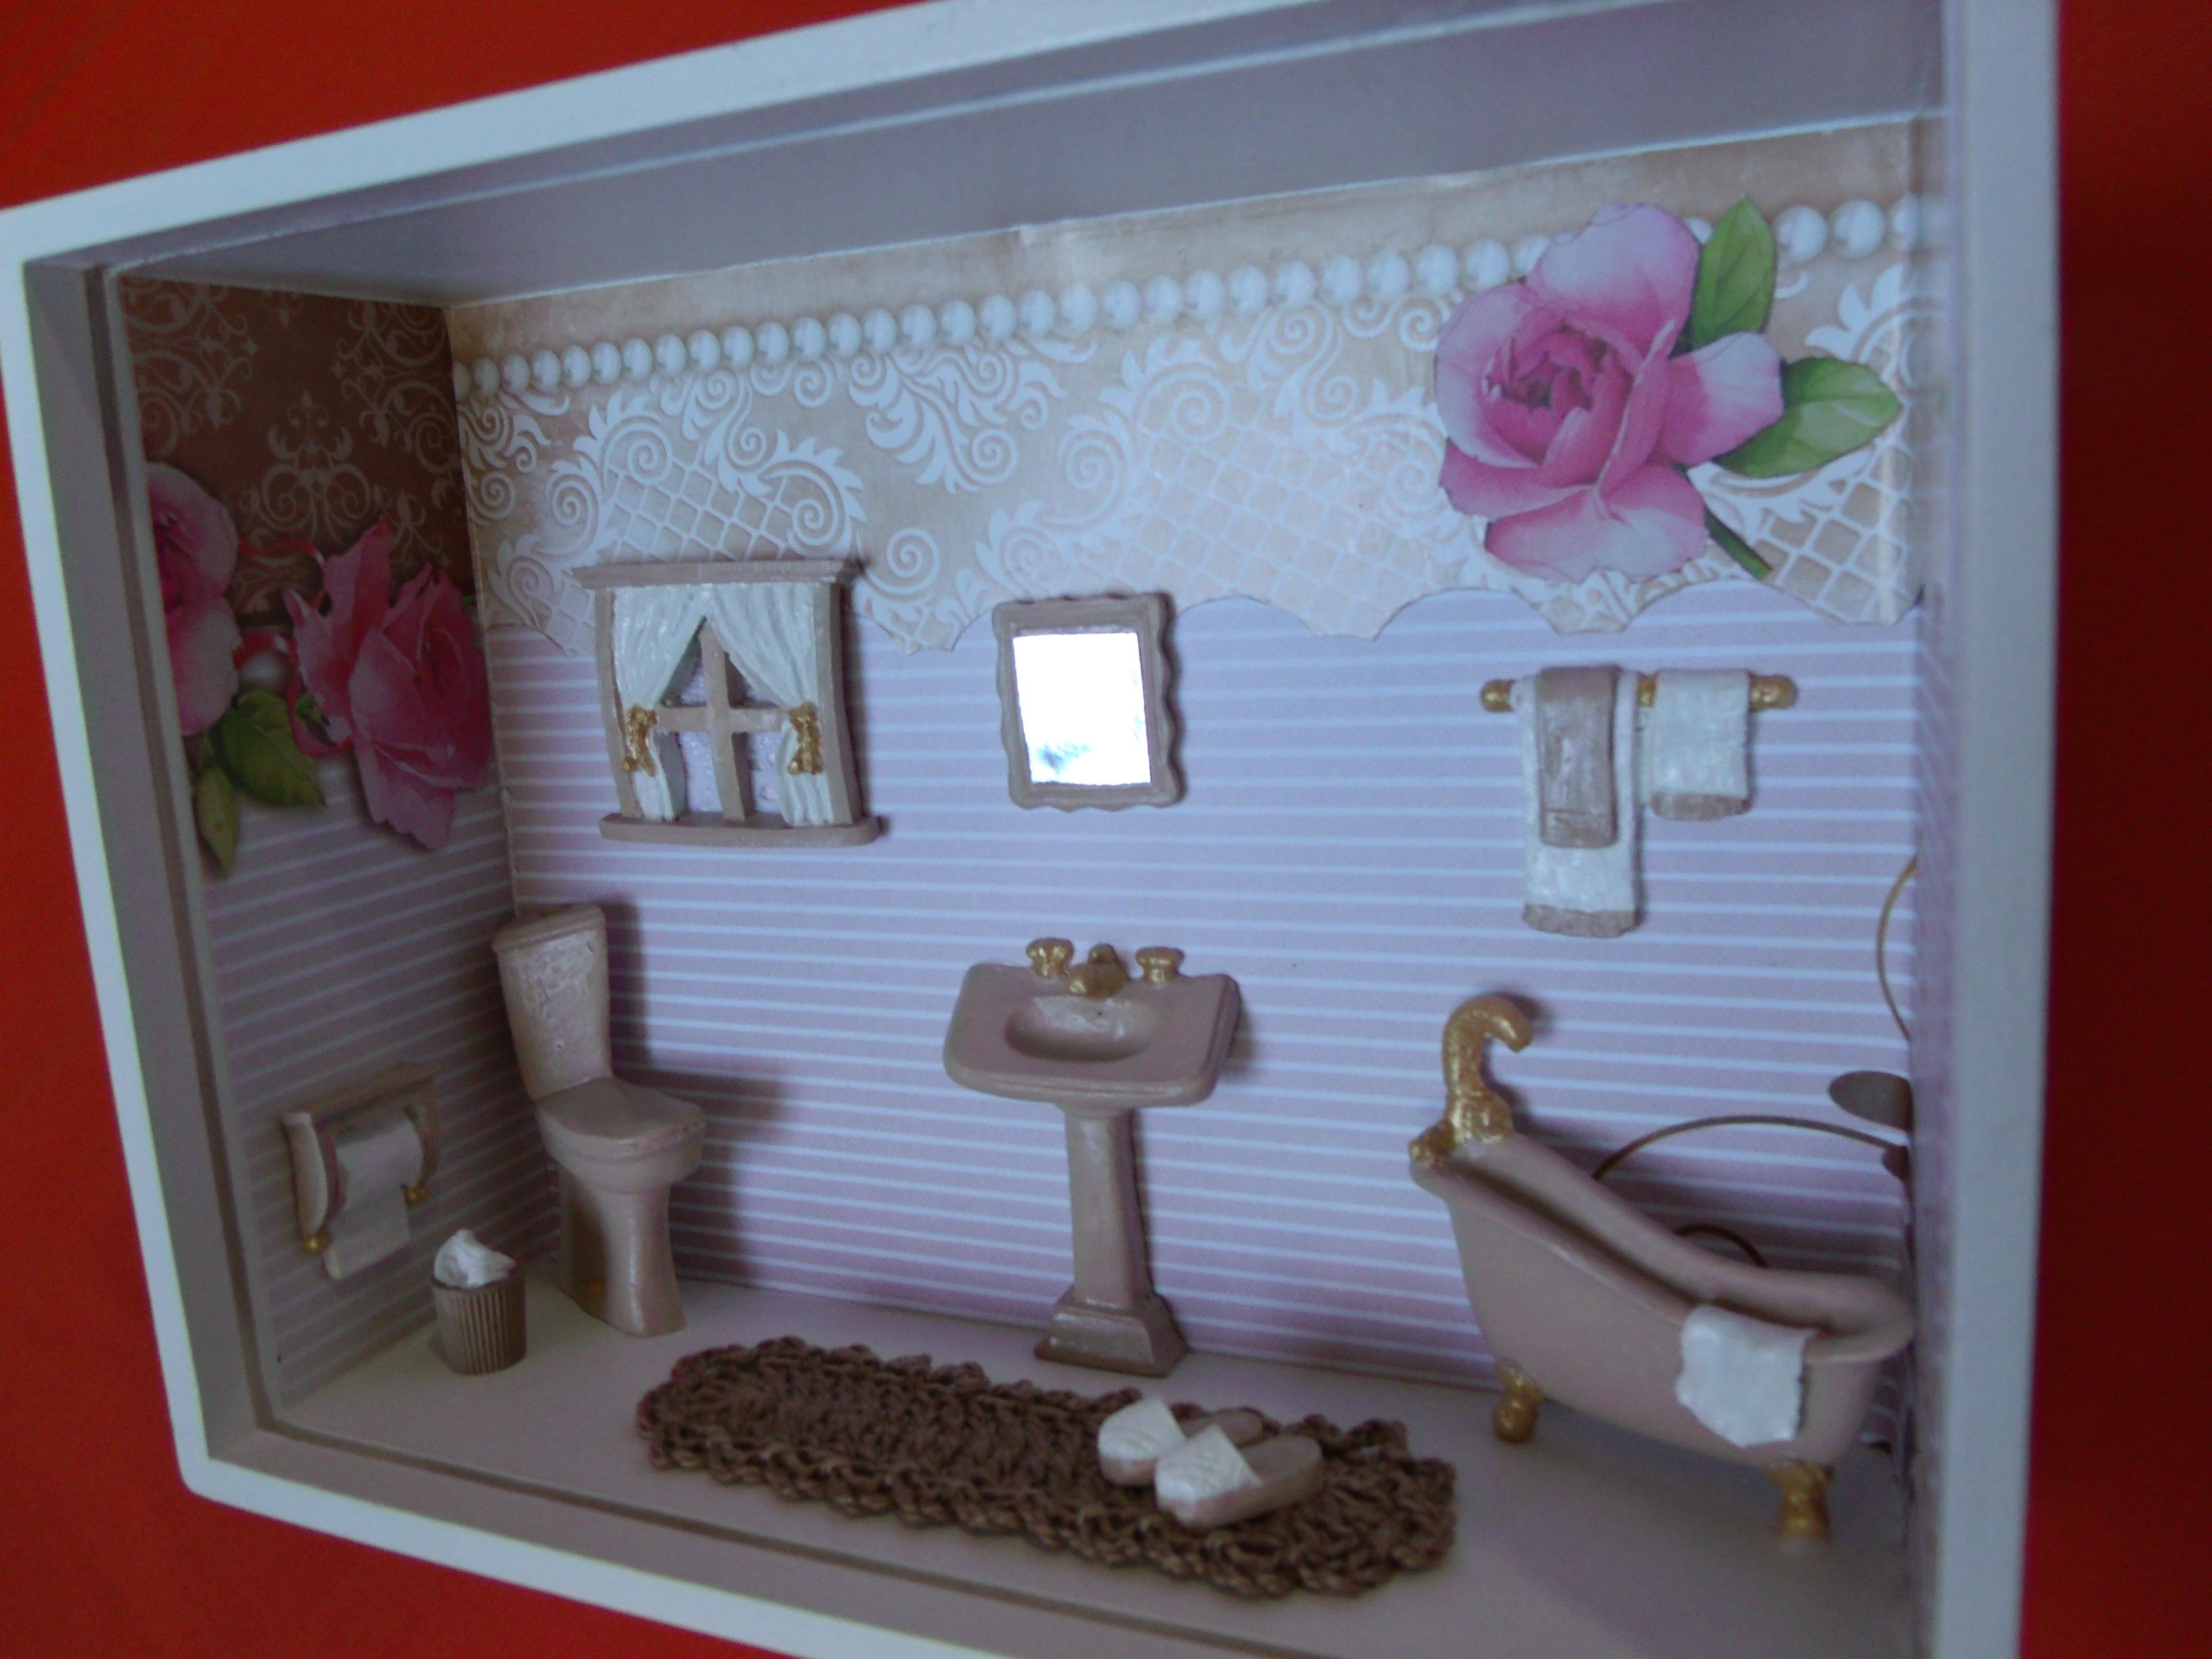 nicho de banheiro 8 nicho para banheiro nicho de banheiro 8 mdf #701D16 3264x2448 Banheiro Com Nicho Vermelho